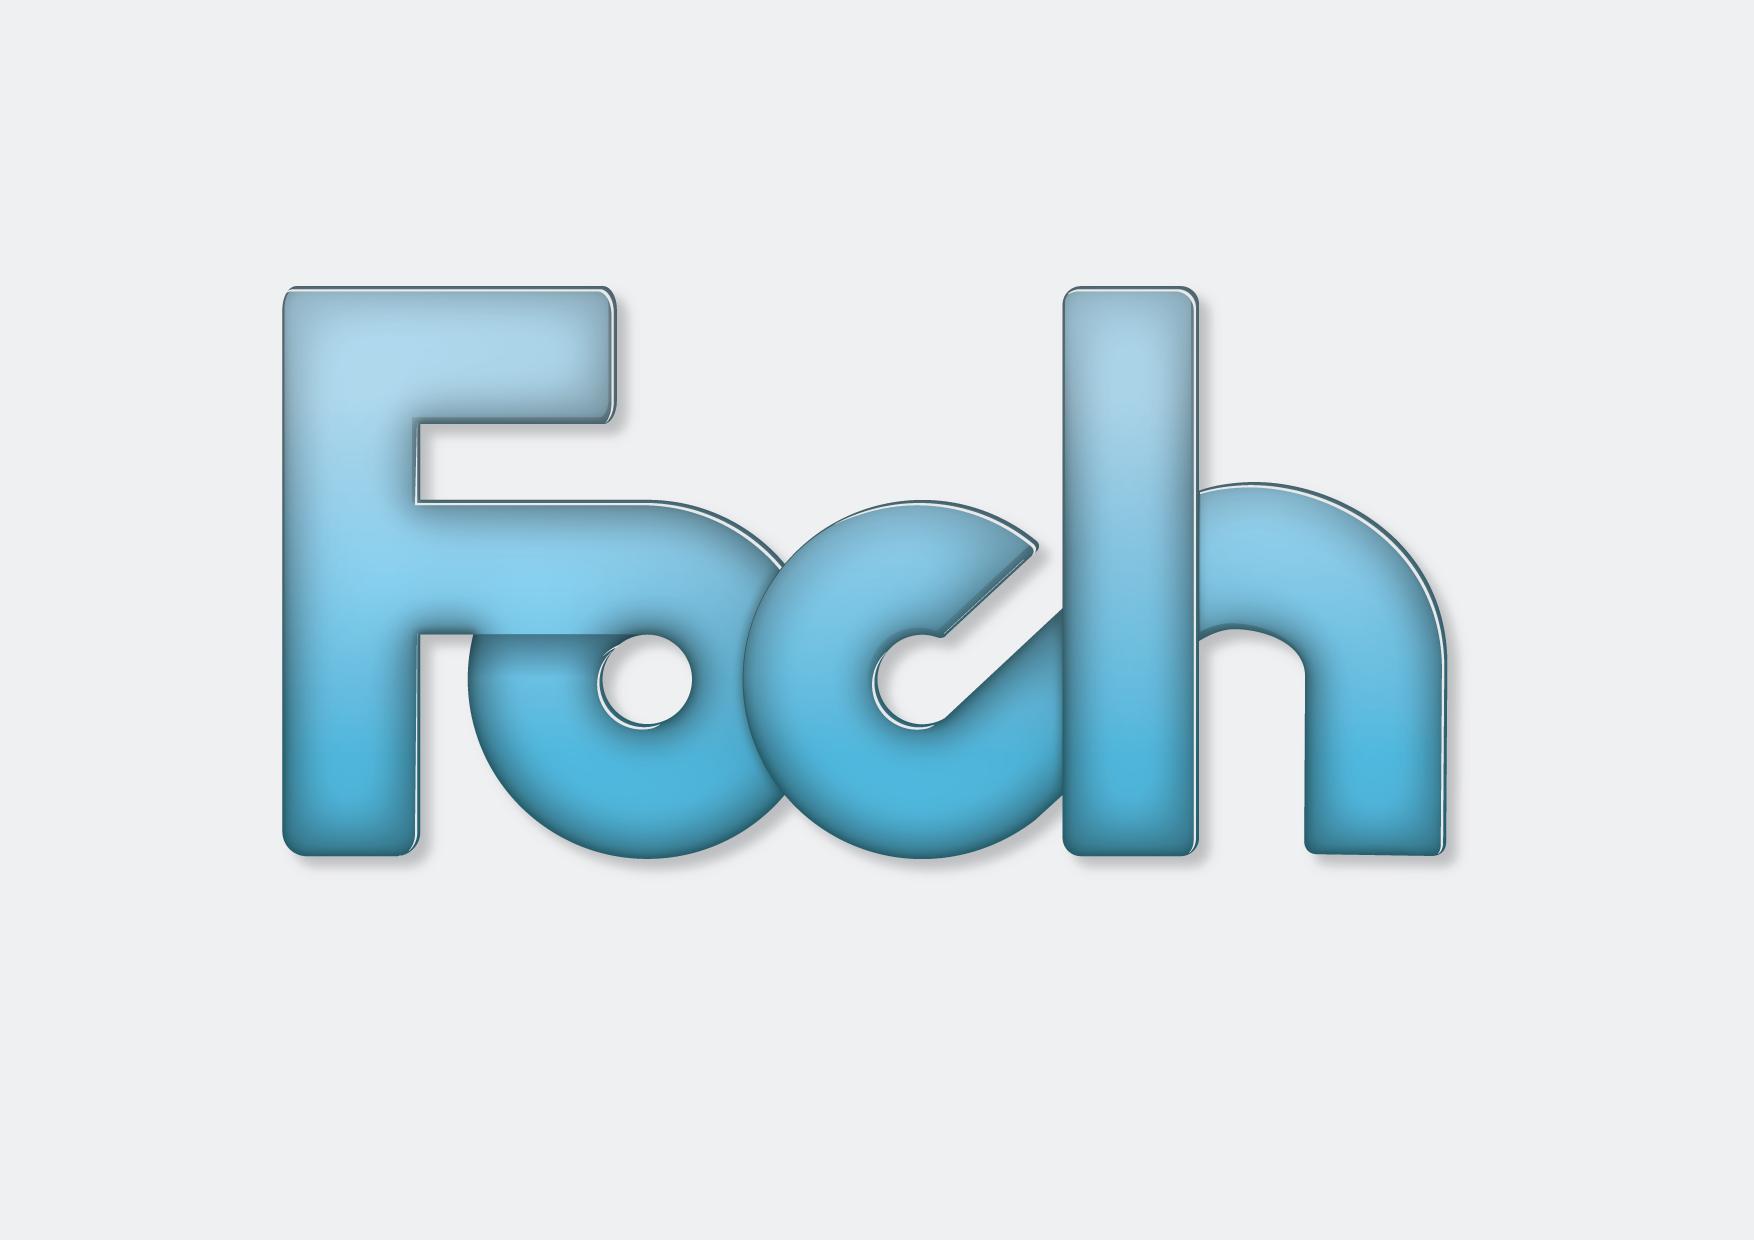 Foch Agency (Fuji Bilgi Teknolojileri Ltd. Sti. )